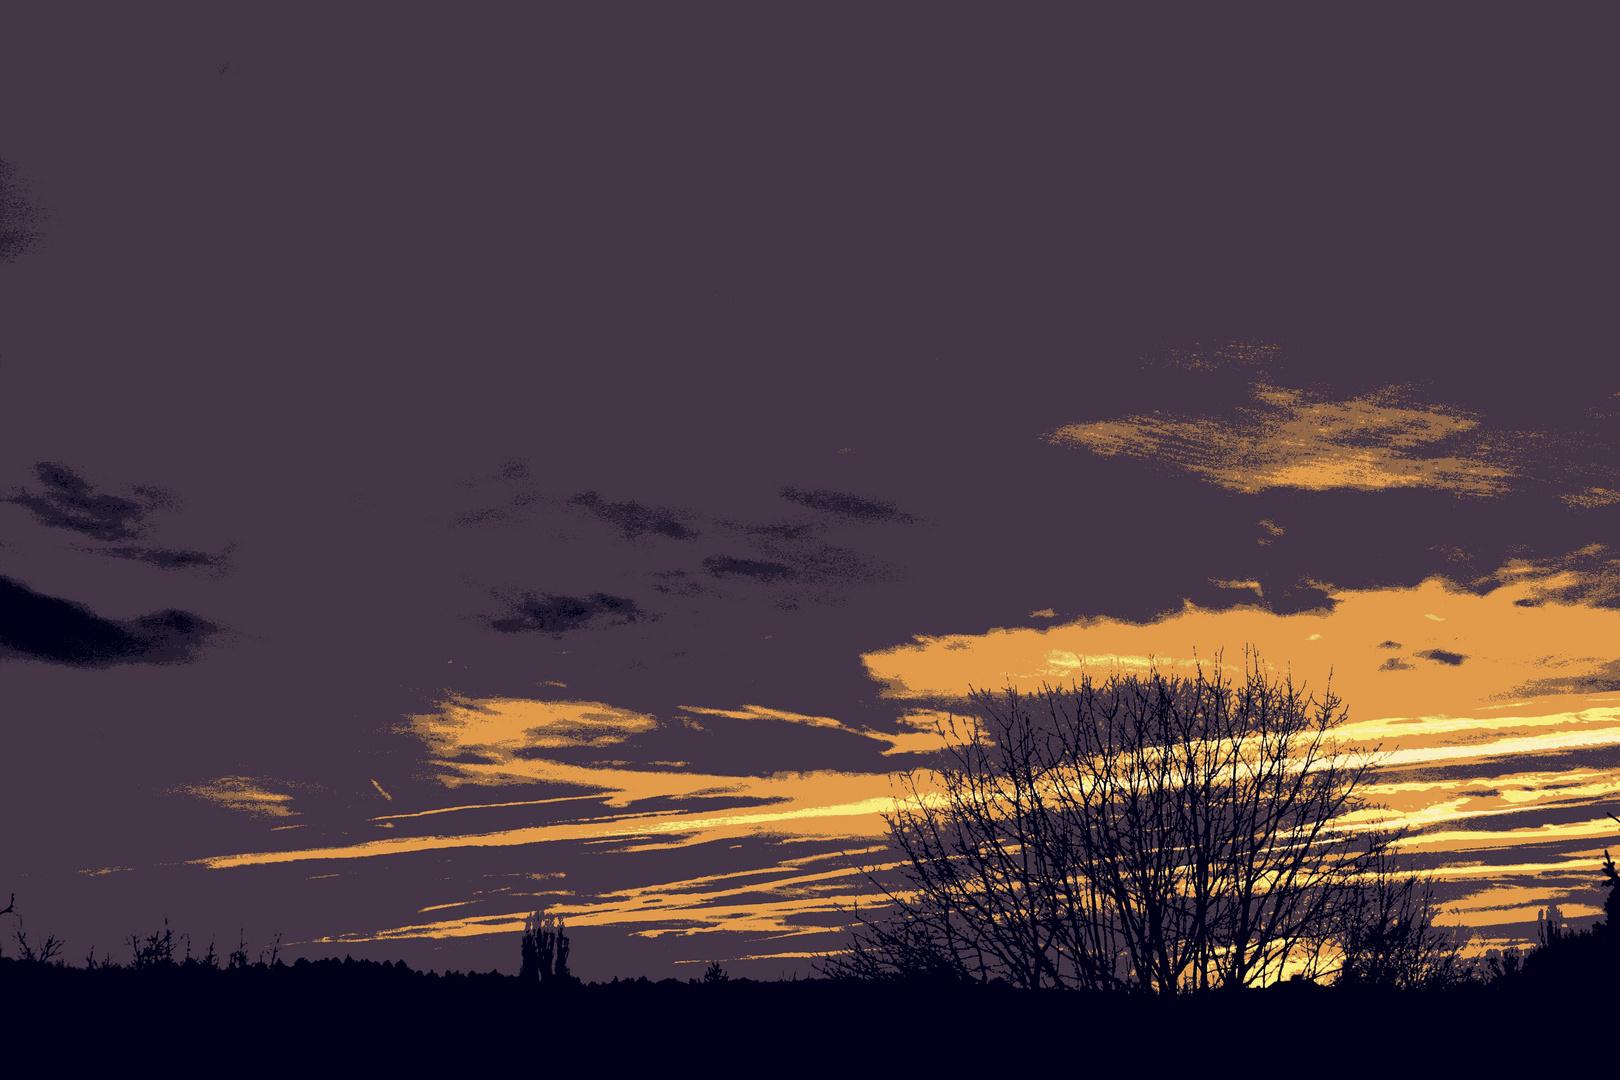 Landschaft im Sonnenuntergang